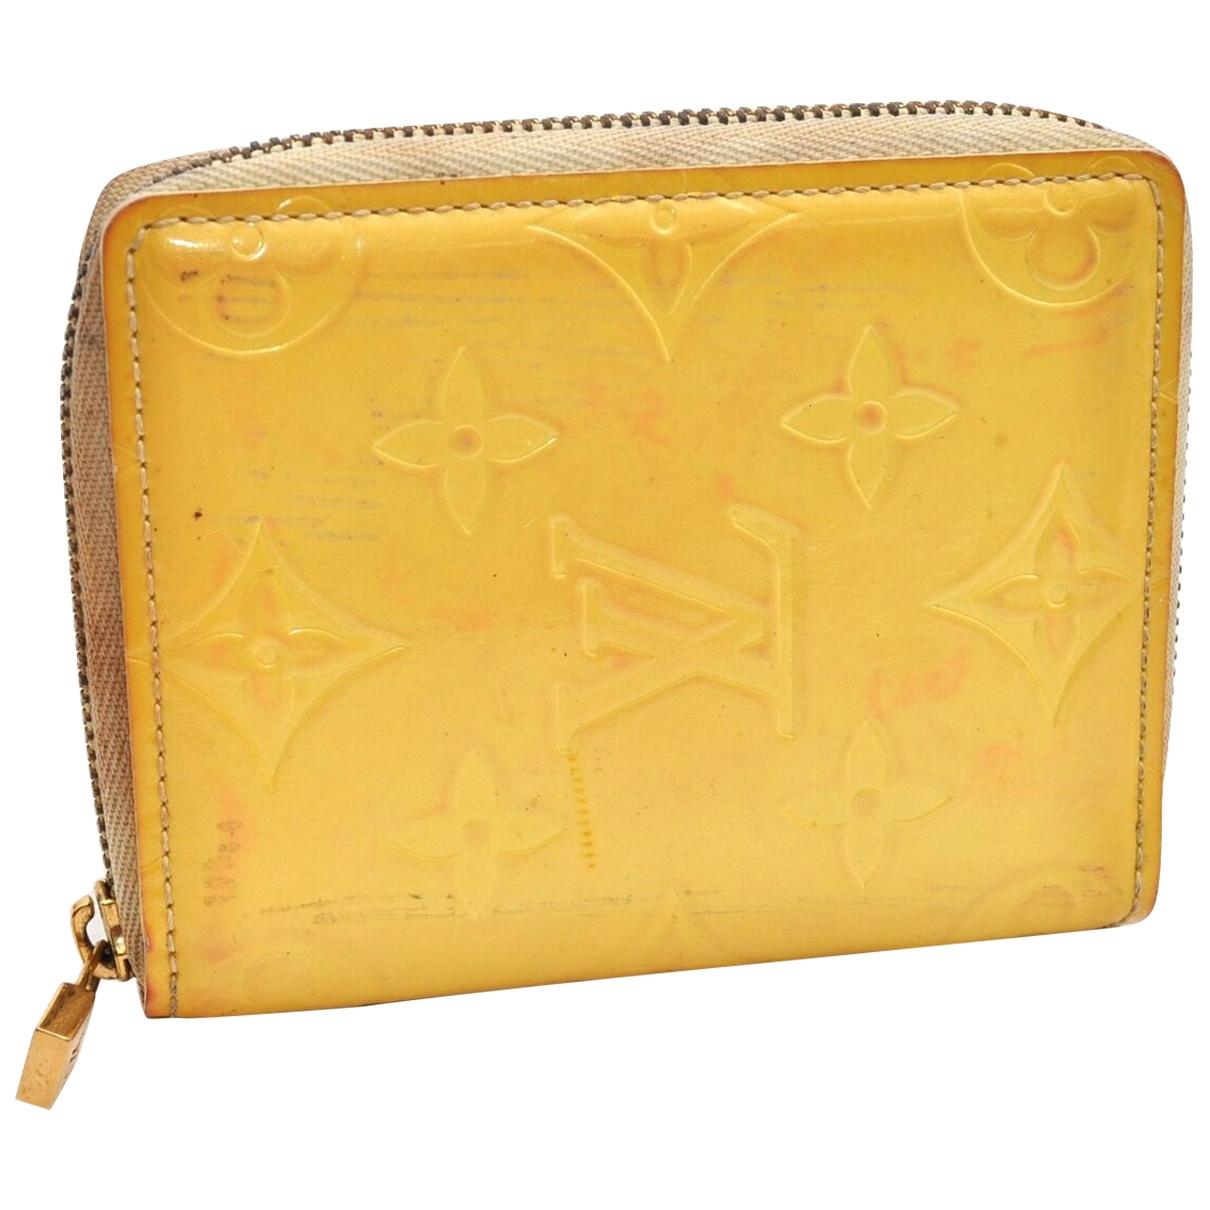 Louis Vuitton \N Portemonnaie in  Gelb Lackleder